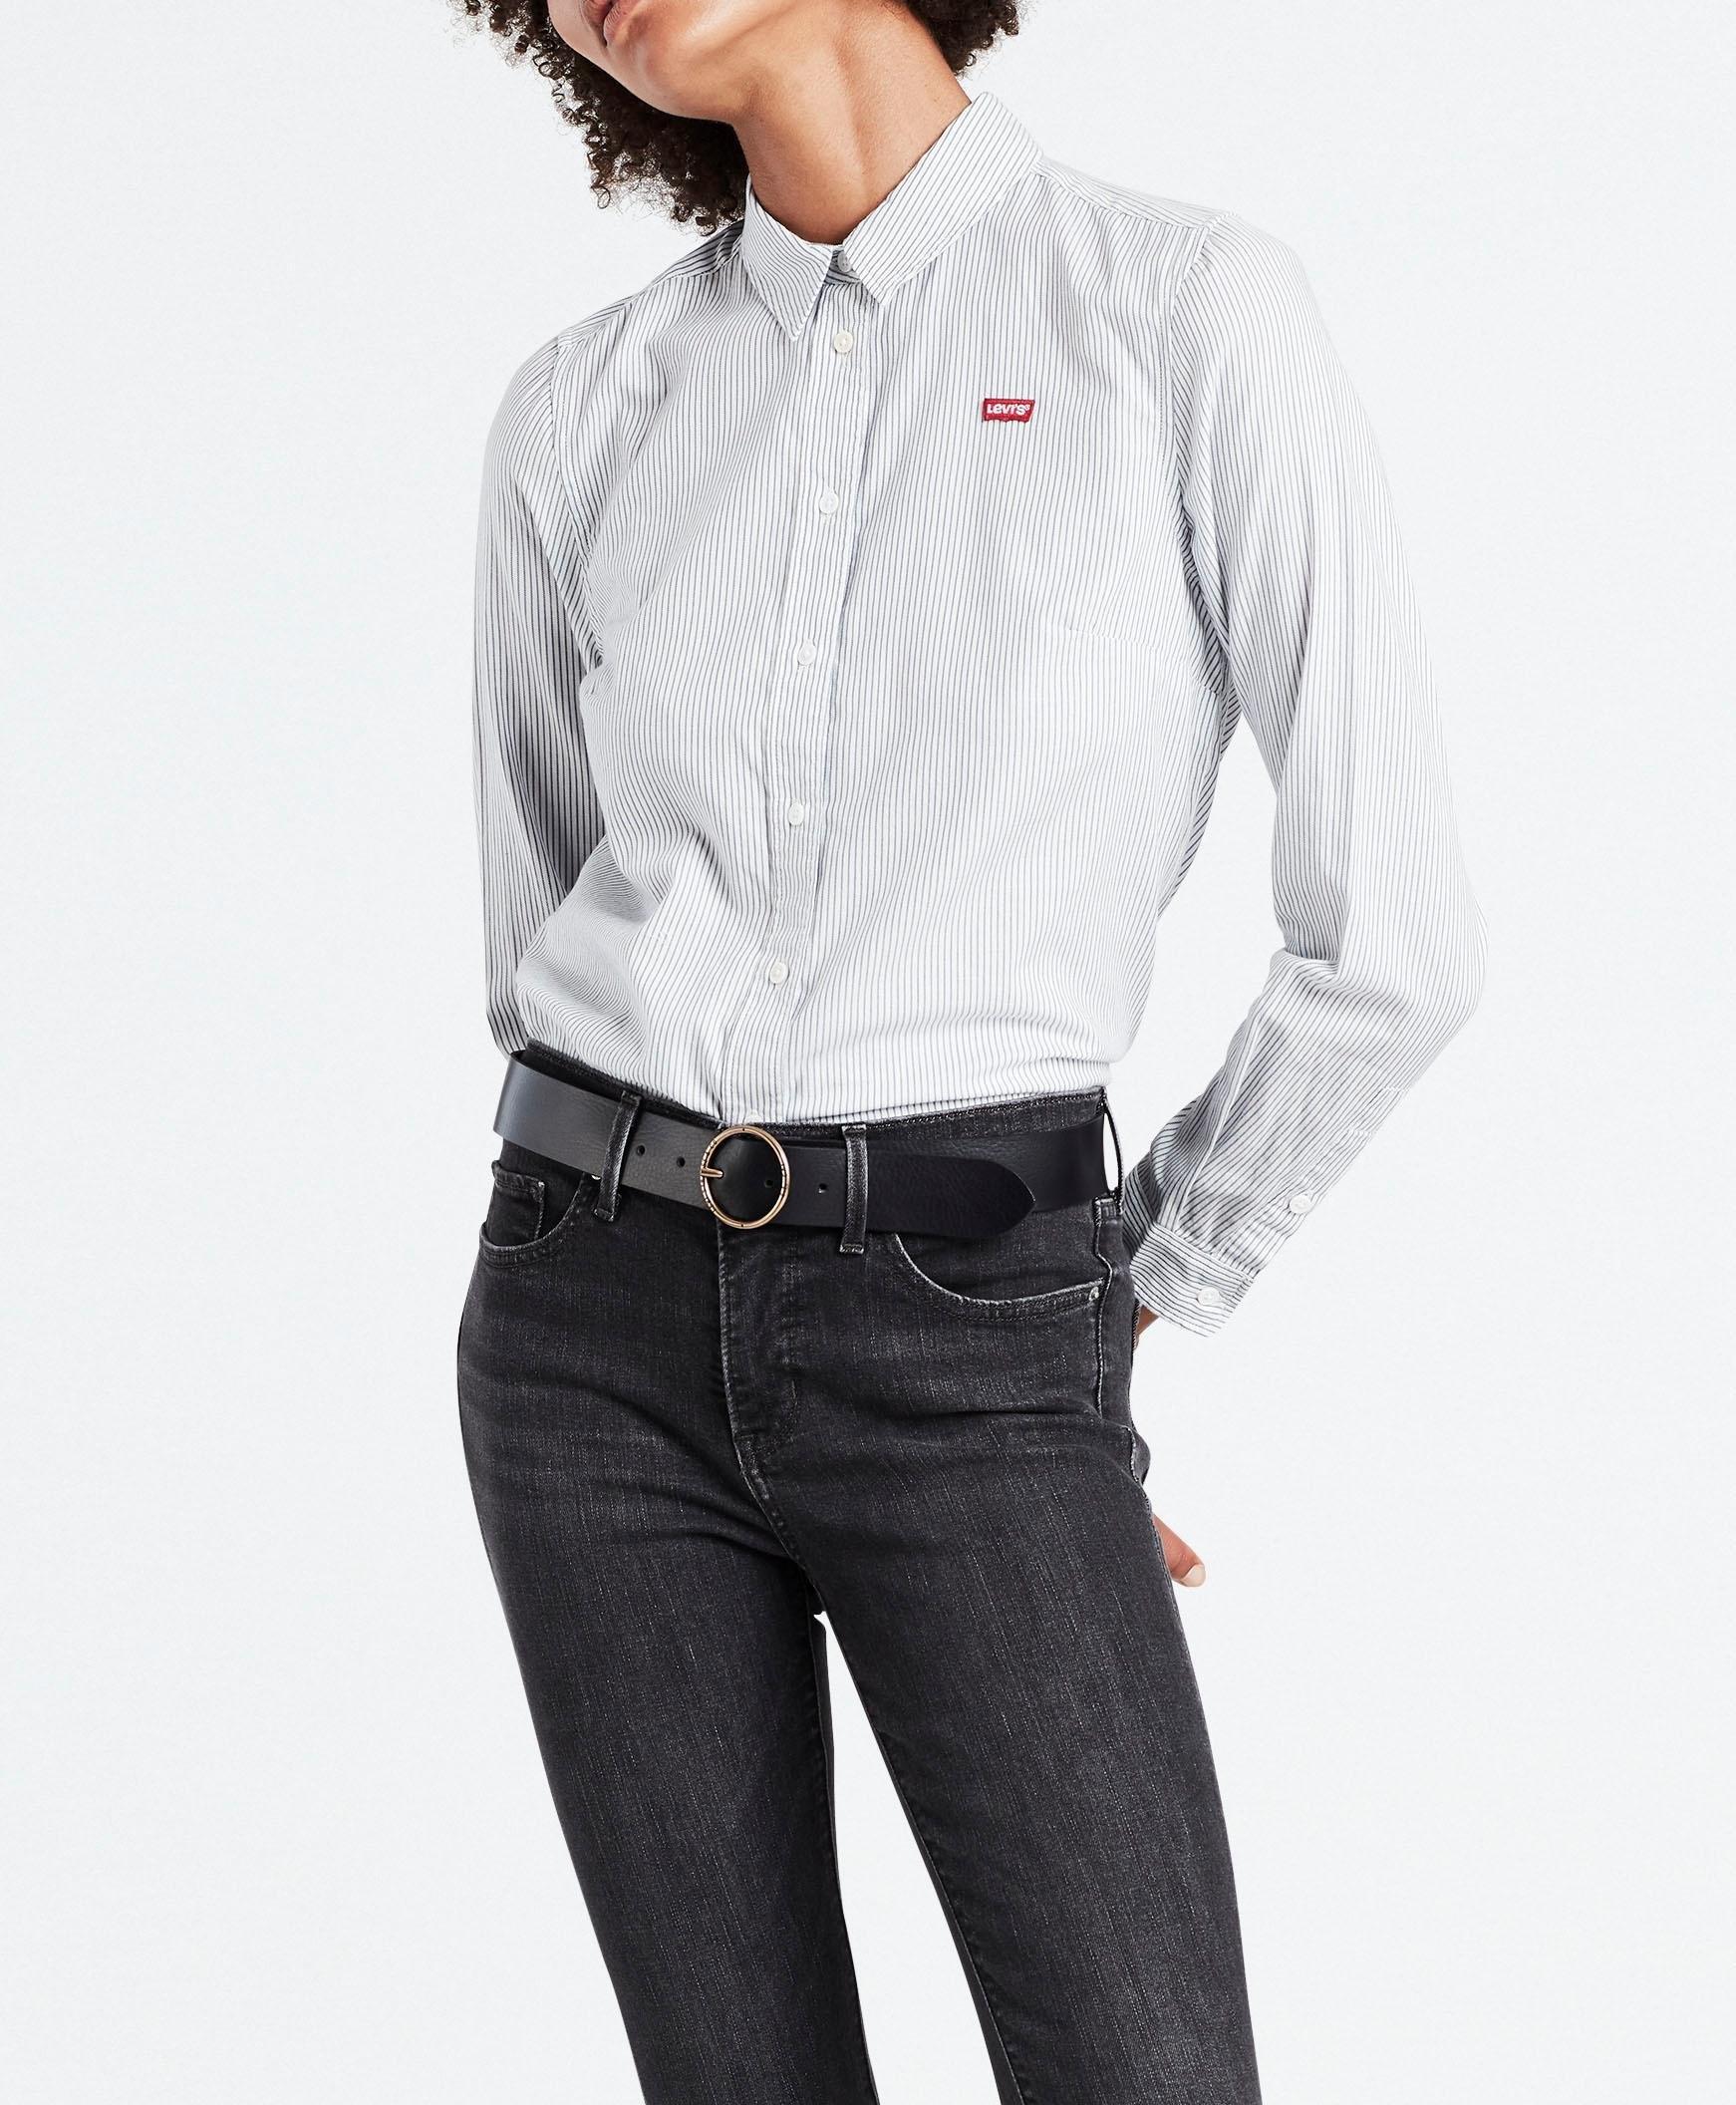 LEVI'S klassieke blouse »Ultimate shirt« - verschillende betaalmethodes